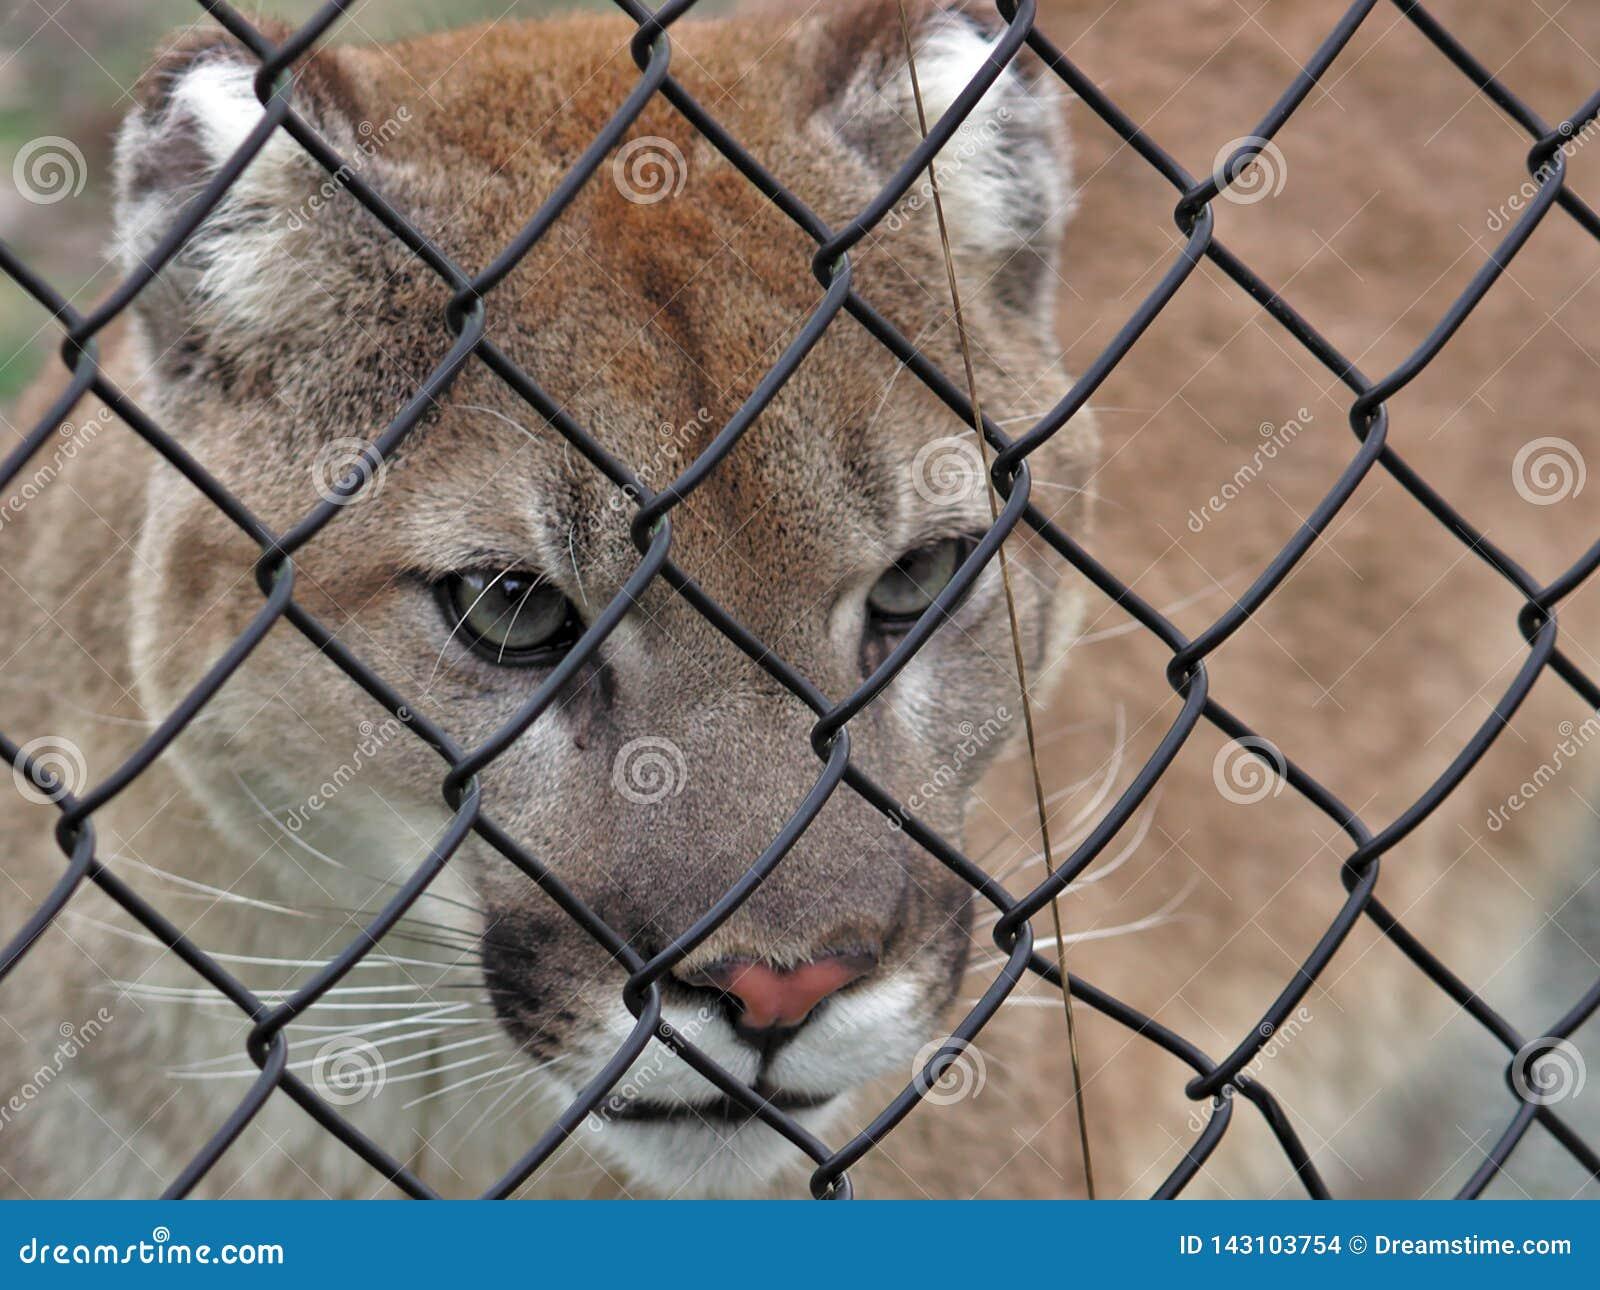 Aldergrove, Βρετανική Κολομβία 25 Μαρτίου 2019 - ένα Couger δίνει ρυθμό στο κλουβί στο μεγαλύτερο ζωολογικό κήπο του Βανκούβερ